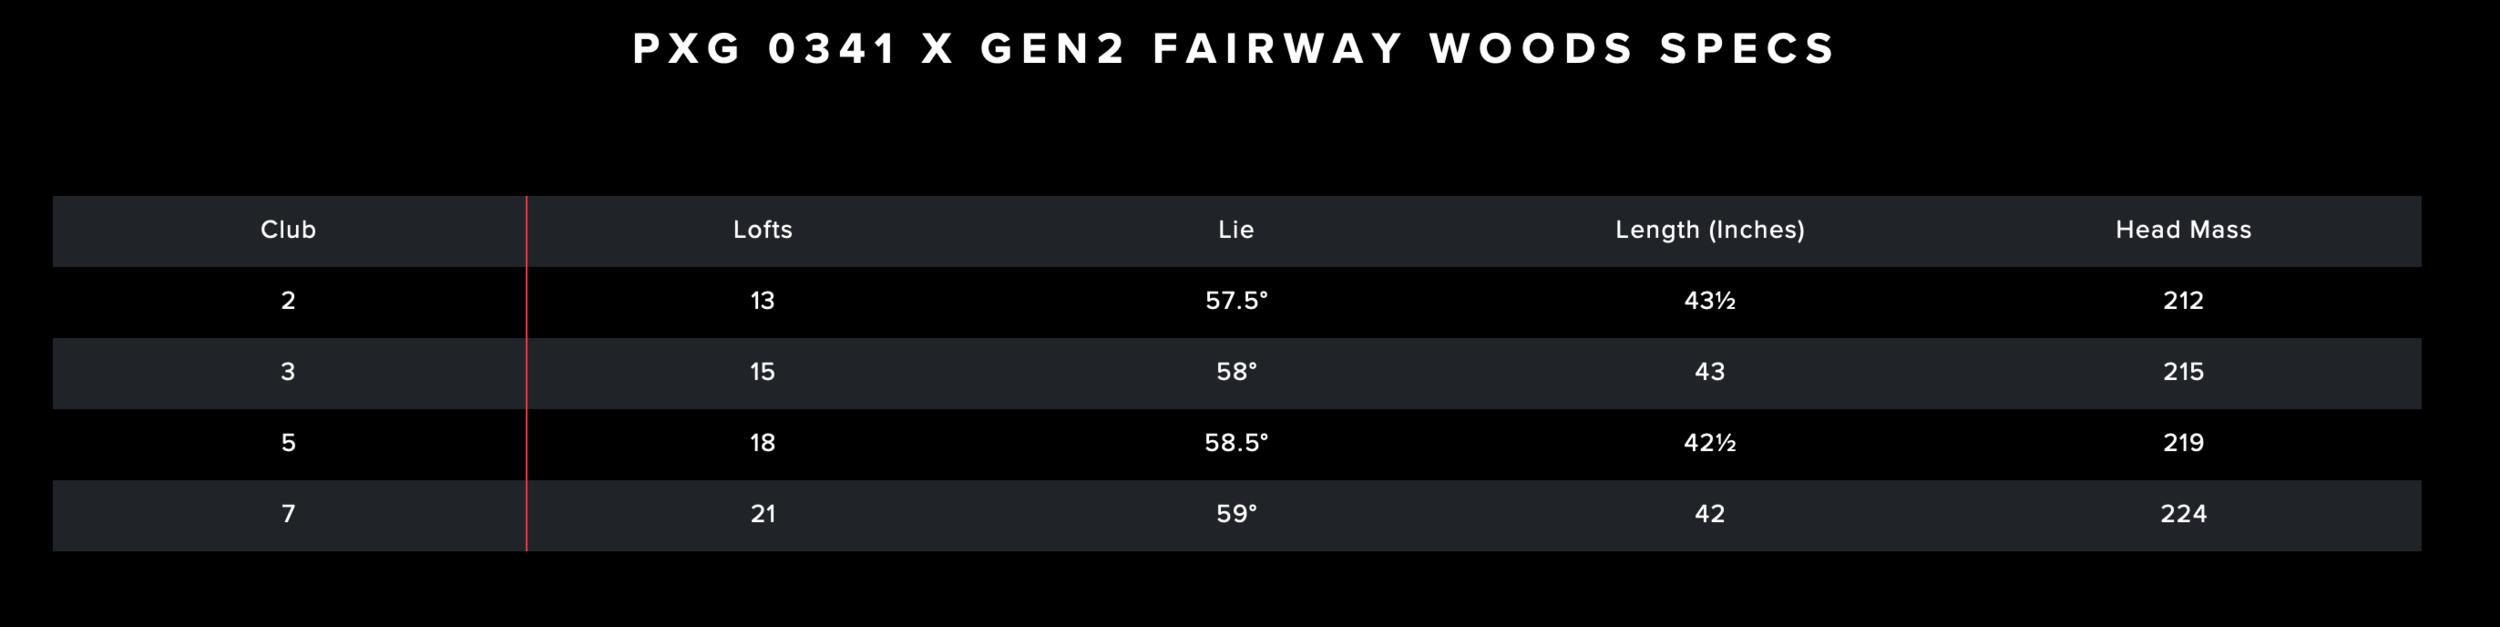 PXG 0341 Fairway Holz Gen2 spezifikationen.png